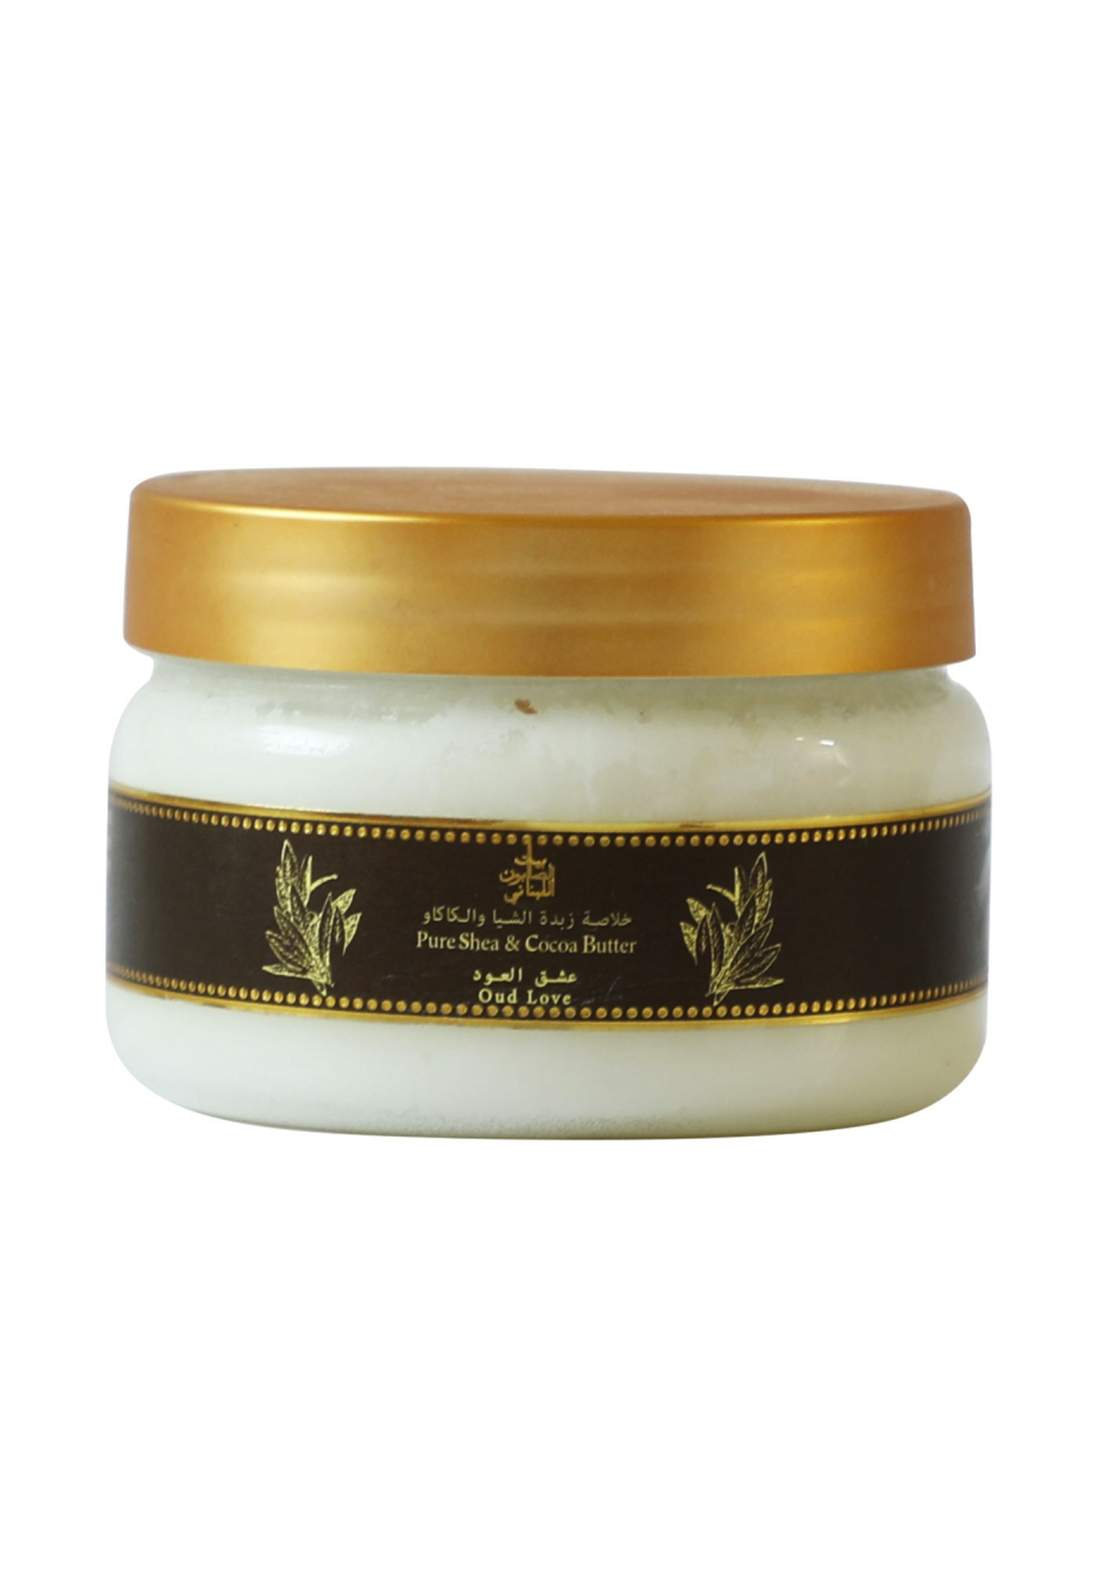 Bayt Alsaboun Alloubnani-317491 Pure Shea&Cocoa Butter Oud Love 115g زبدة الشيا